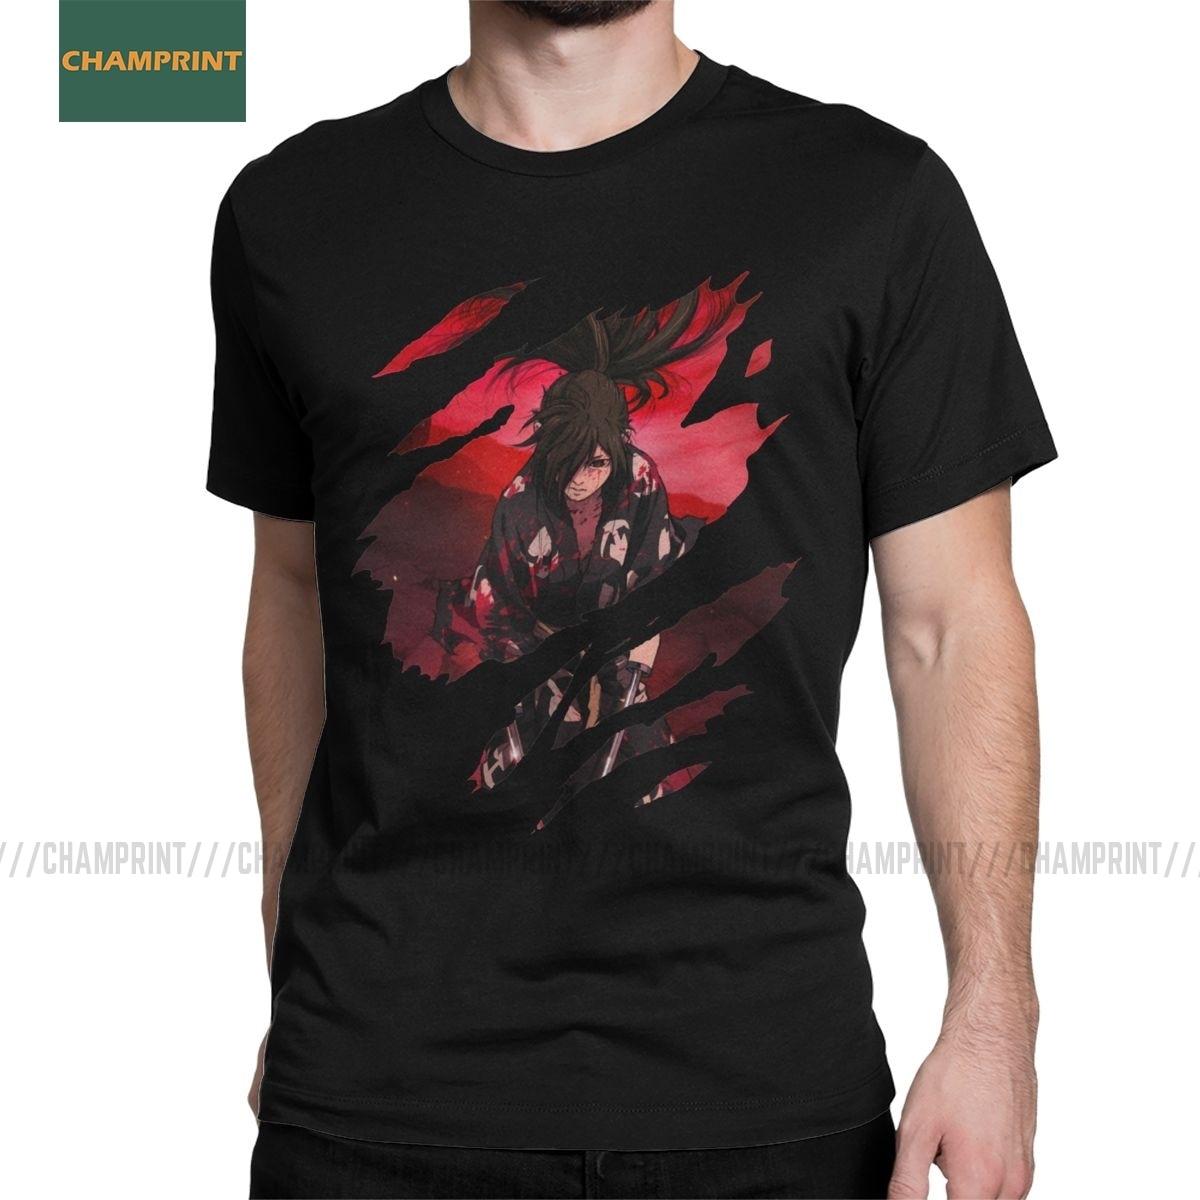 Men Hyakkimaru Dororo T Shirt Anime Manga Japan Otaku Samurai Sword Naruto Demon Cotton Short Sleeve Tees Birthday Gift T-Shirts